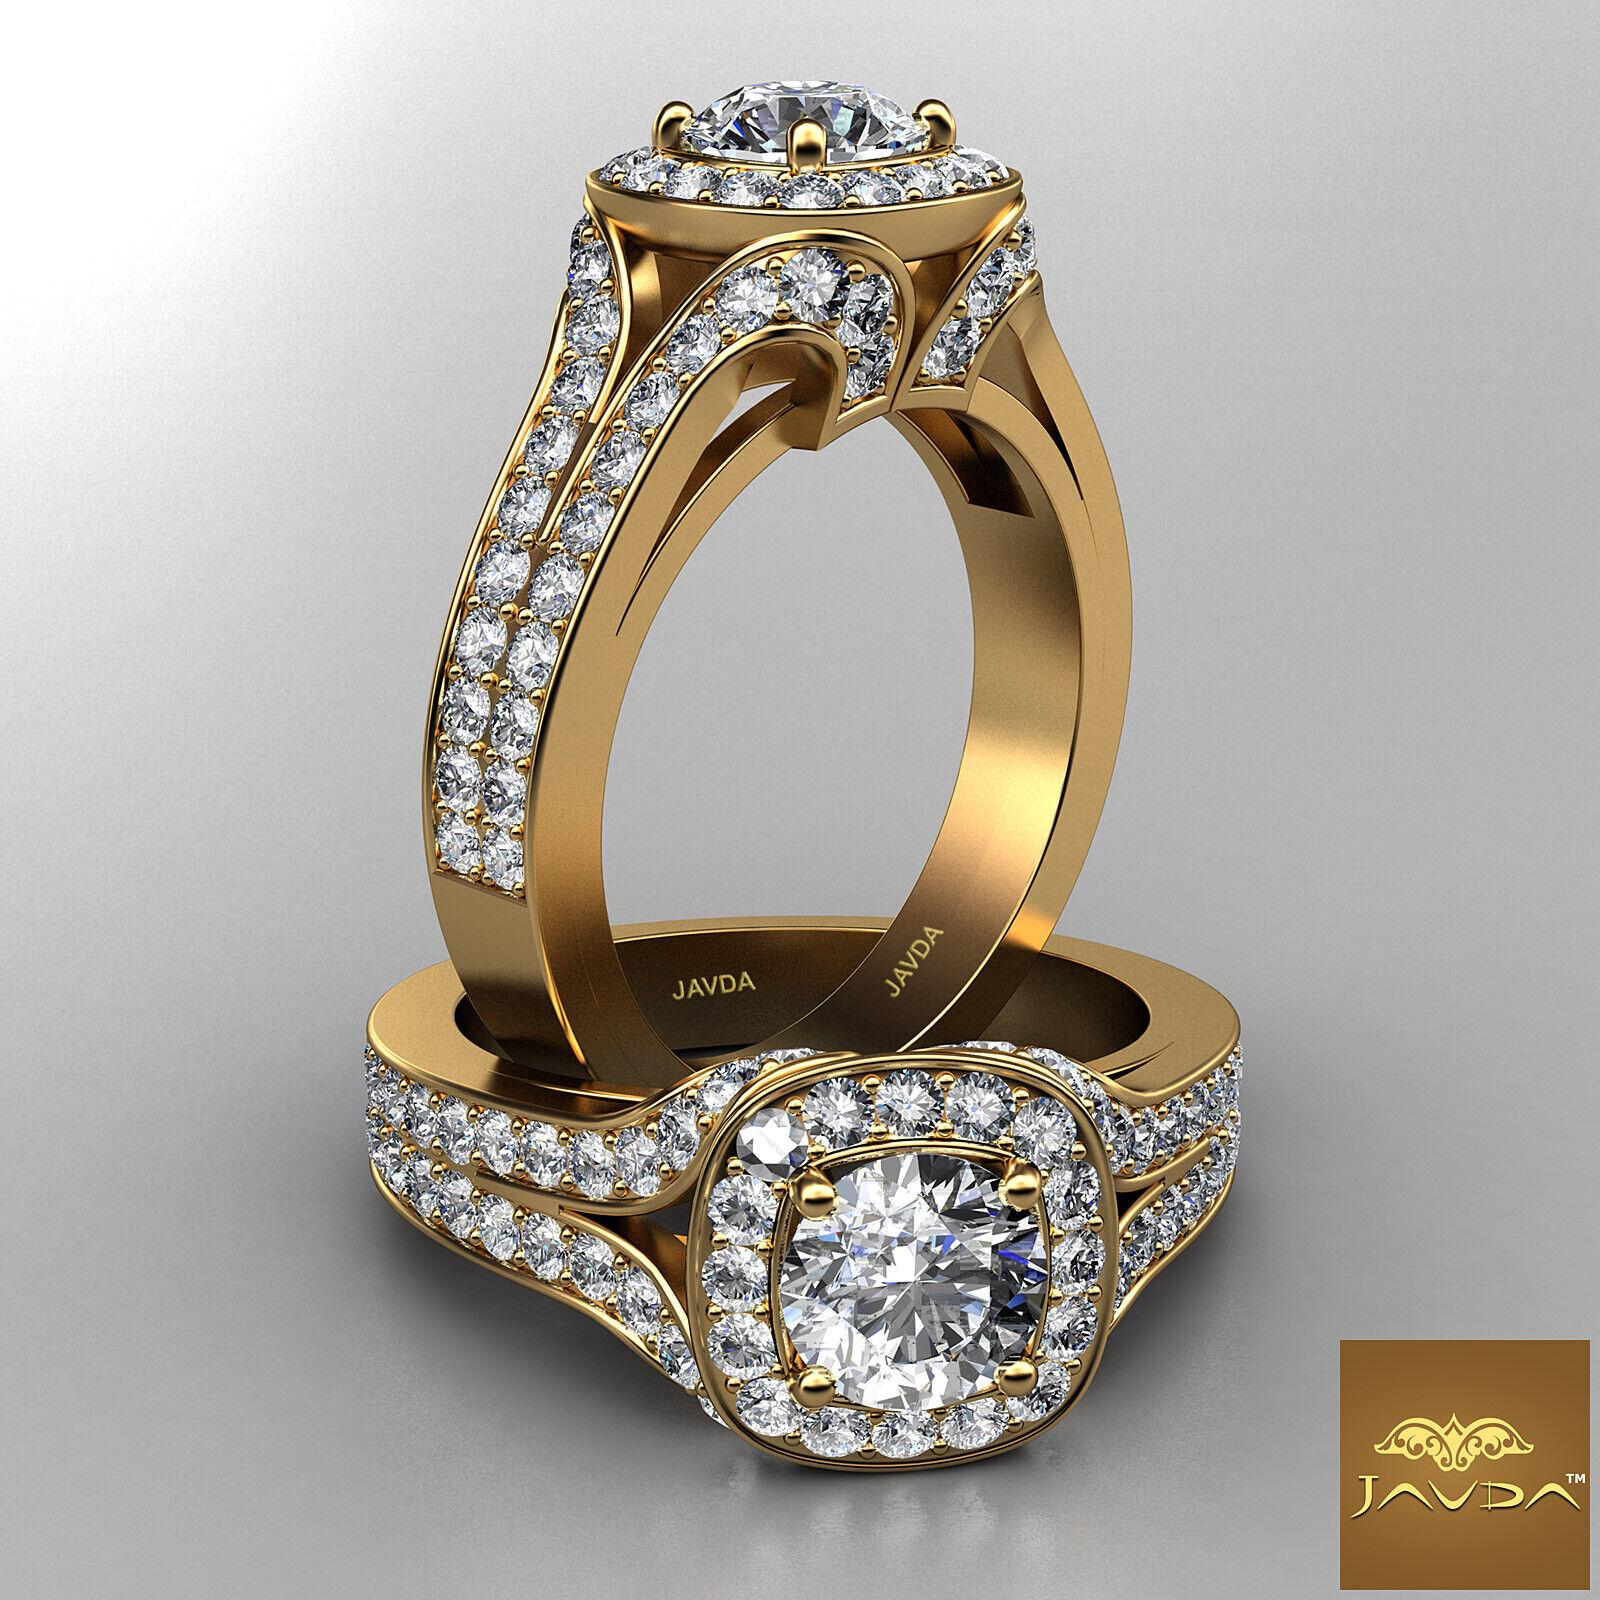 Bridge Accent Halo Round Cut Diamond Engagement Split Shank Ring GIA F VS2 1.9Ct